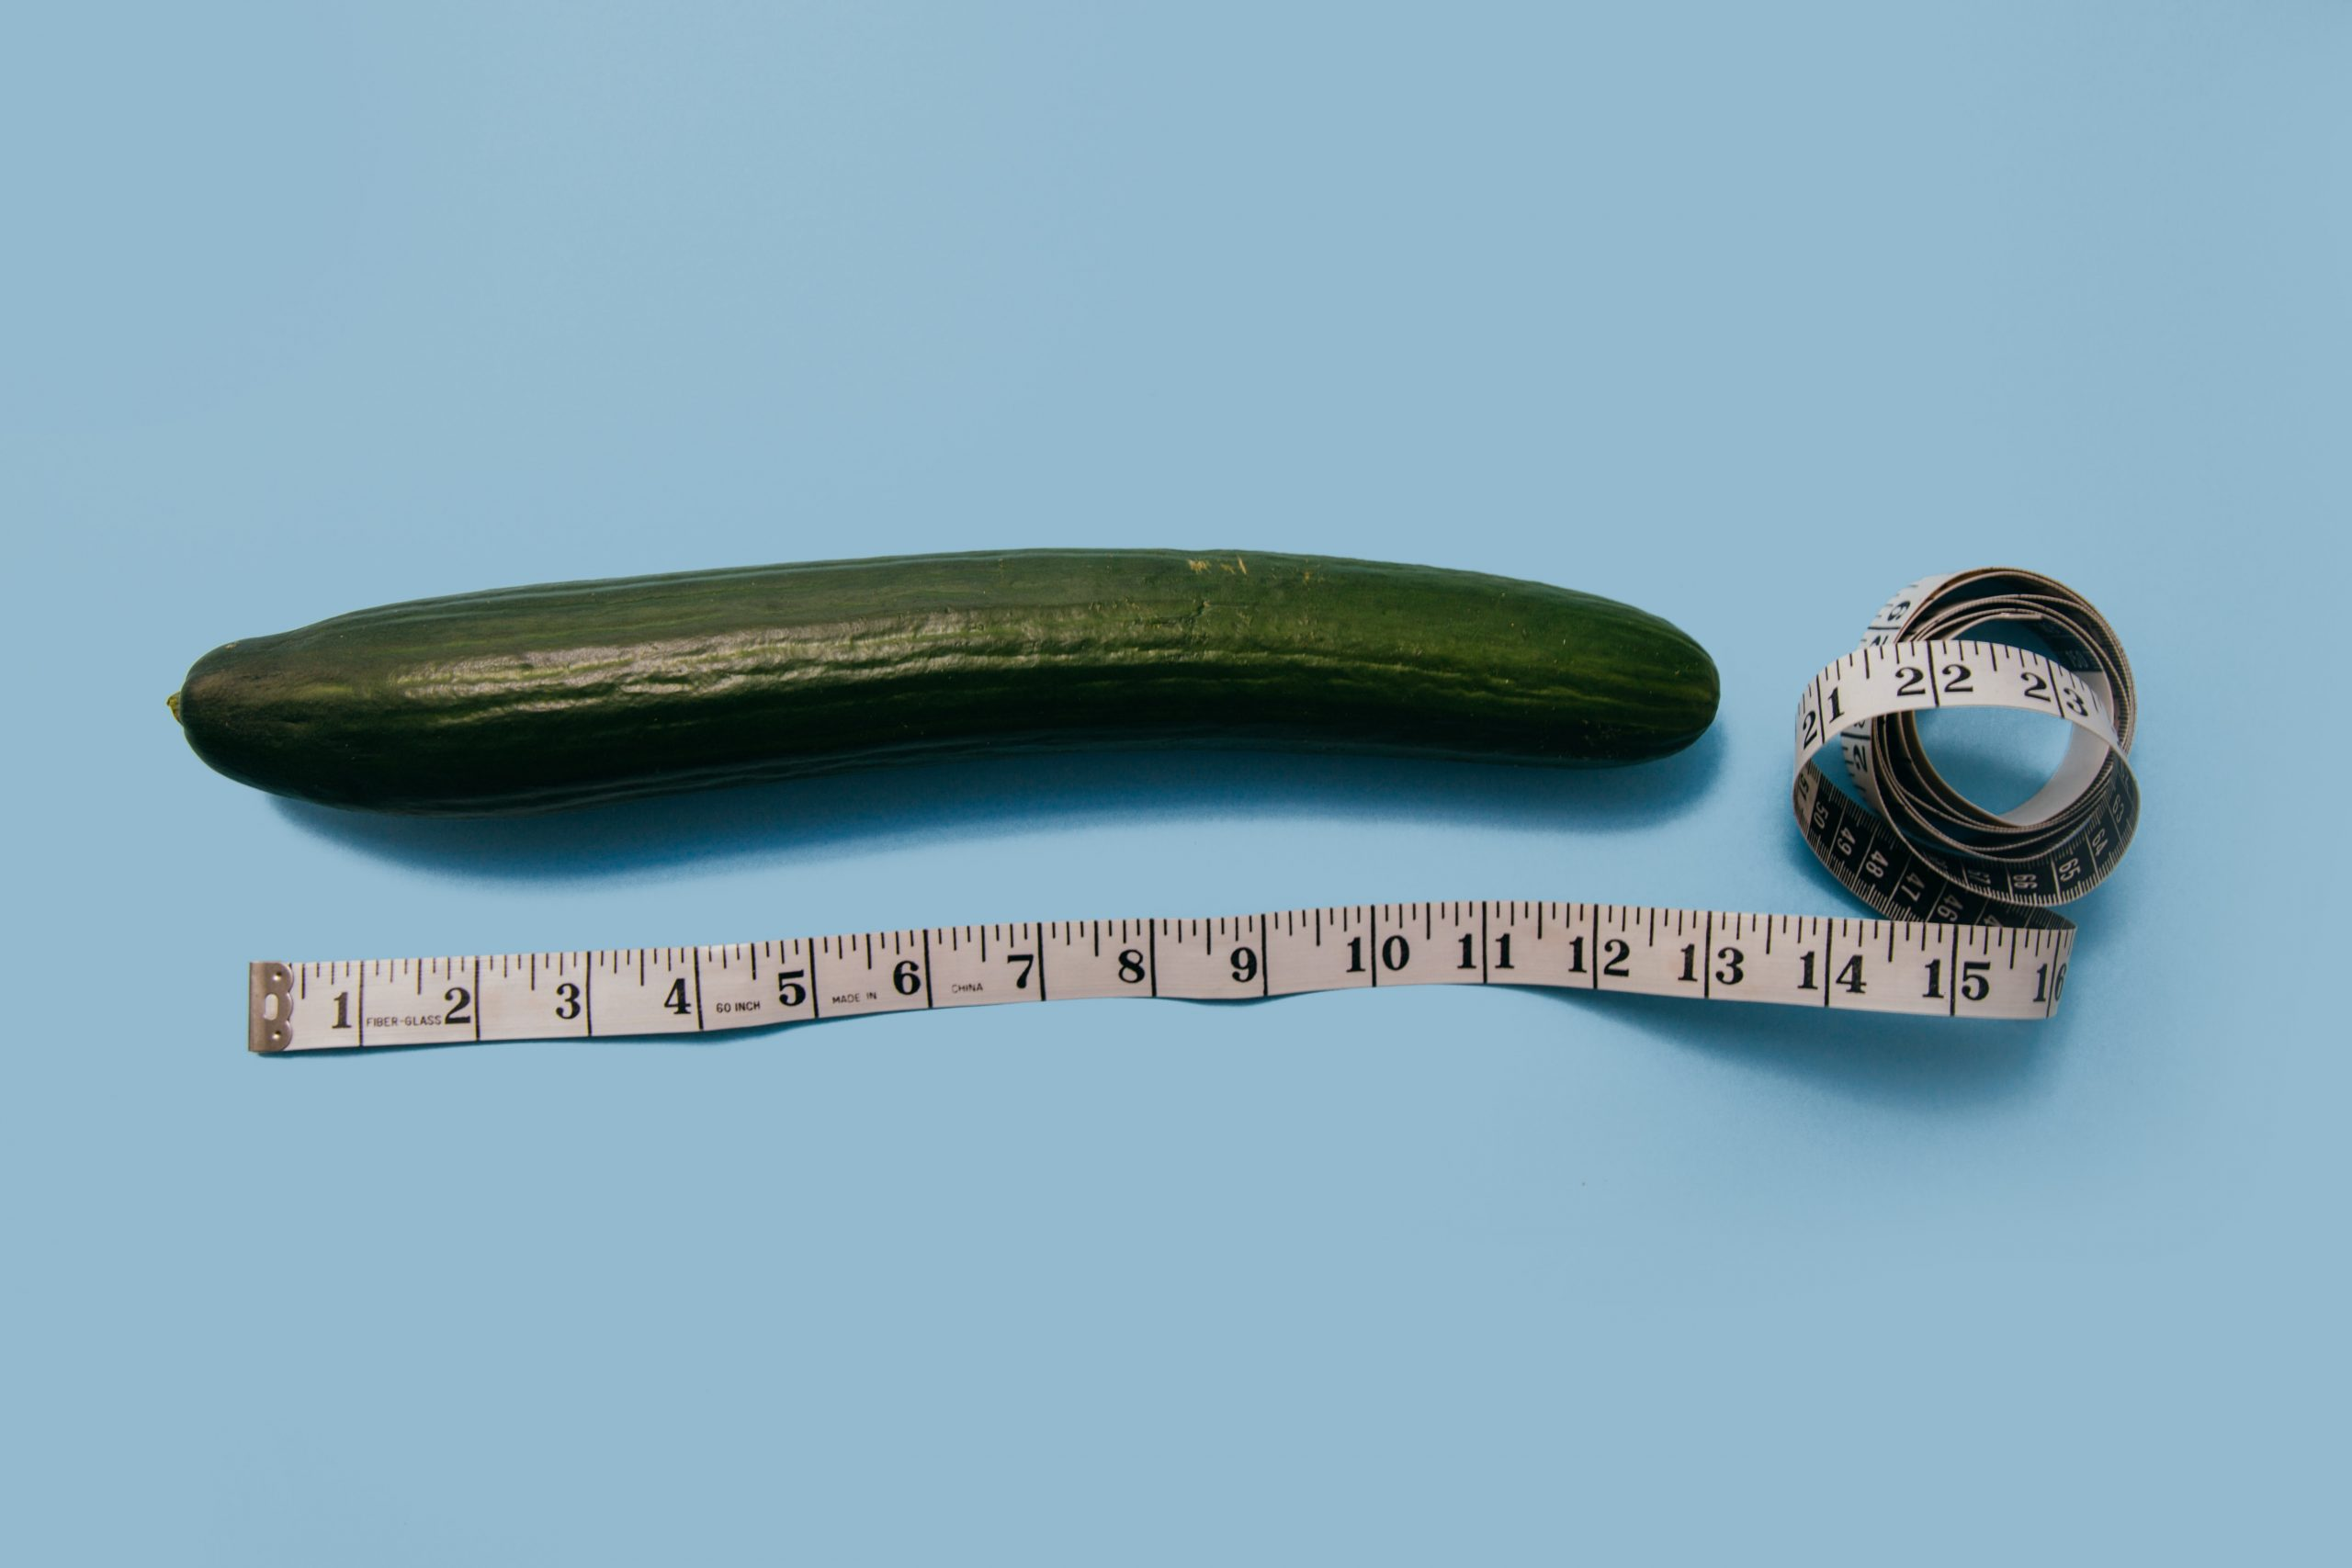 pénisz alakú uborka